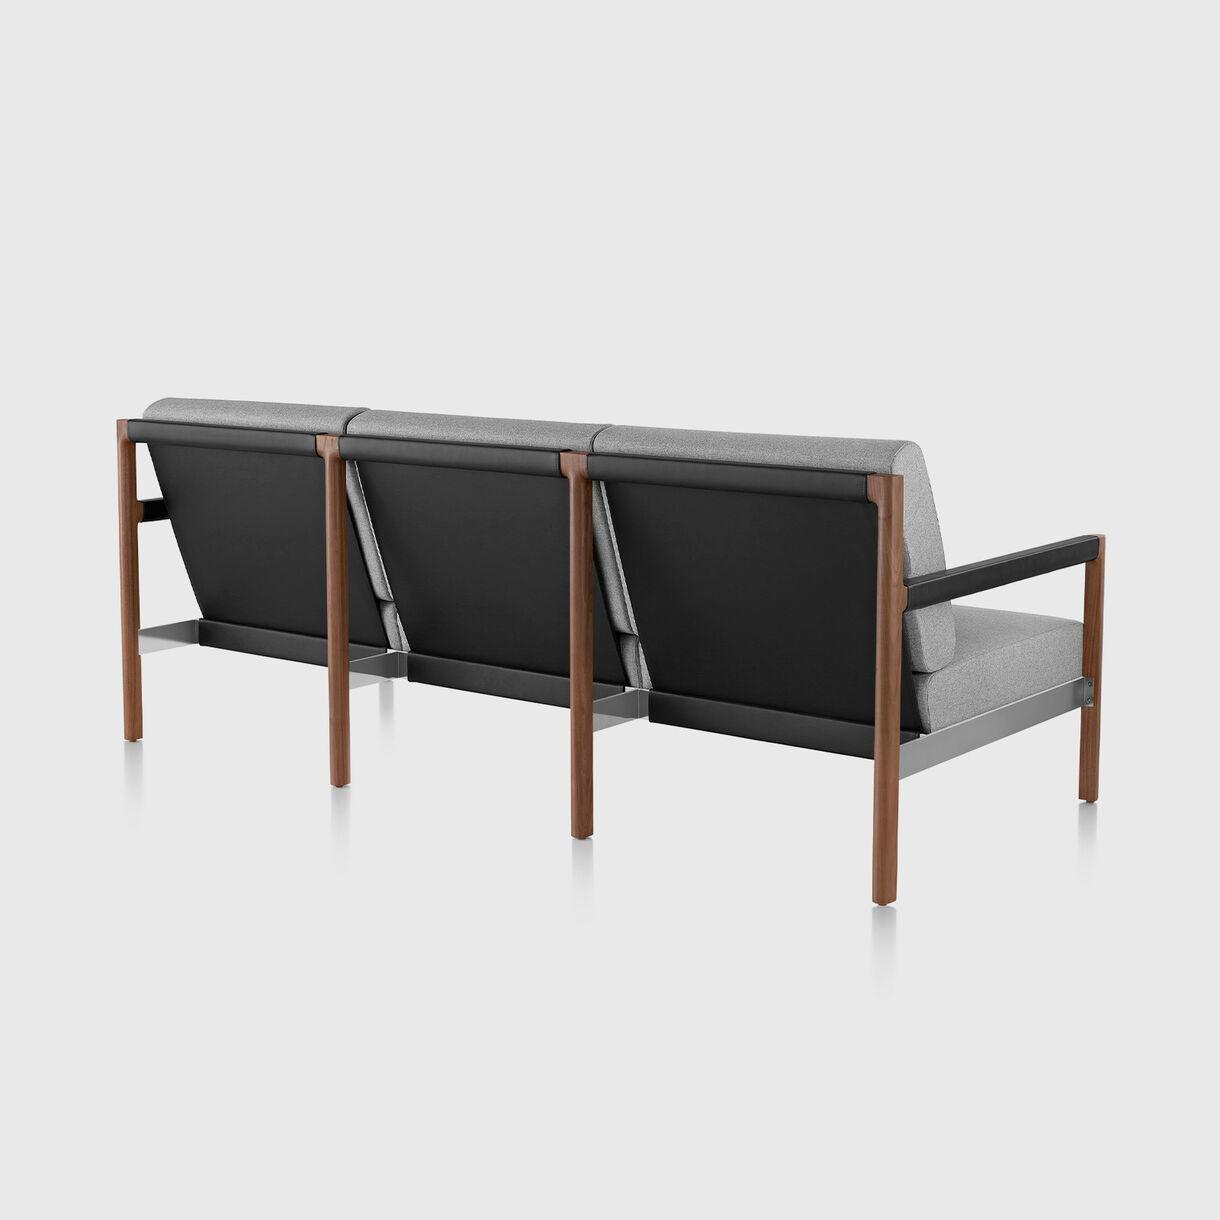 Brabo Sofa, 3 Seater